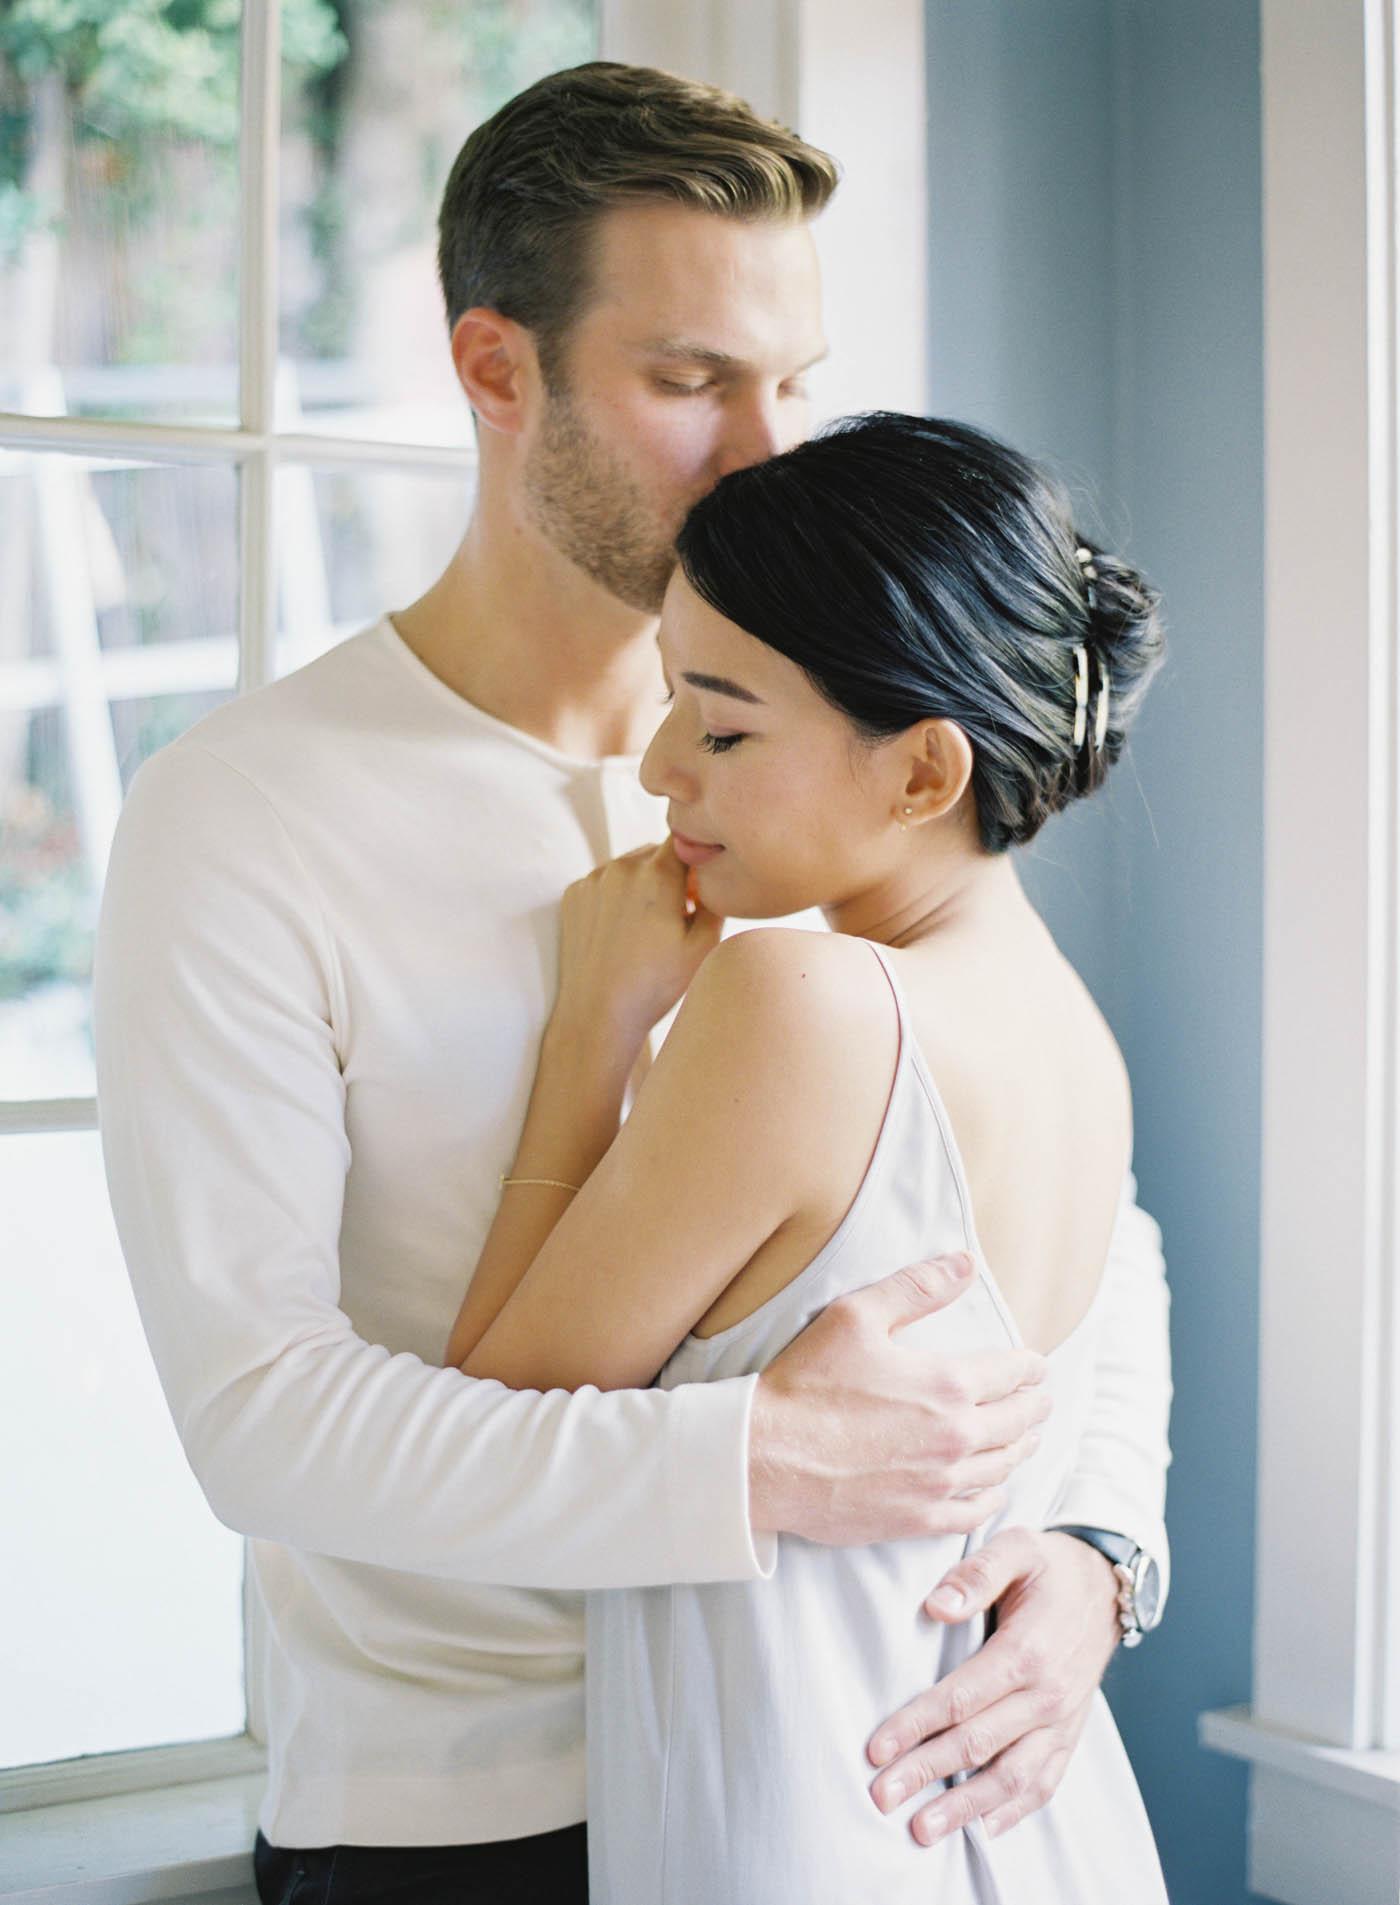 riviera-house-engagement-118-Jen_Huang-Tea-Ceremony-360-Jen_Huang-004147-R1-002.jpg